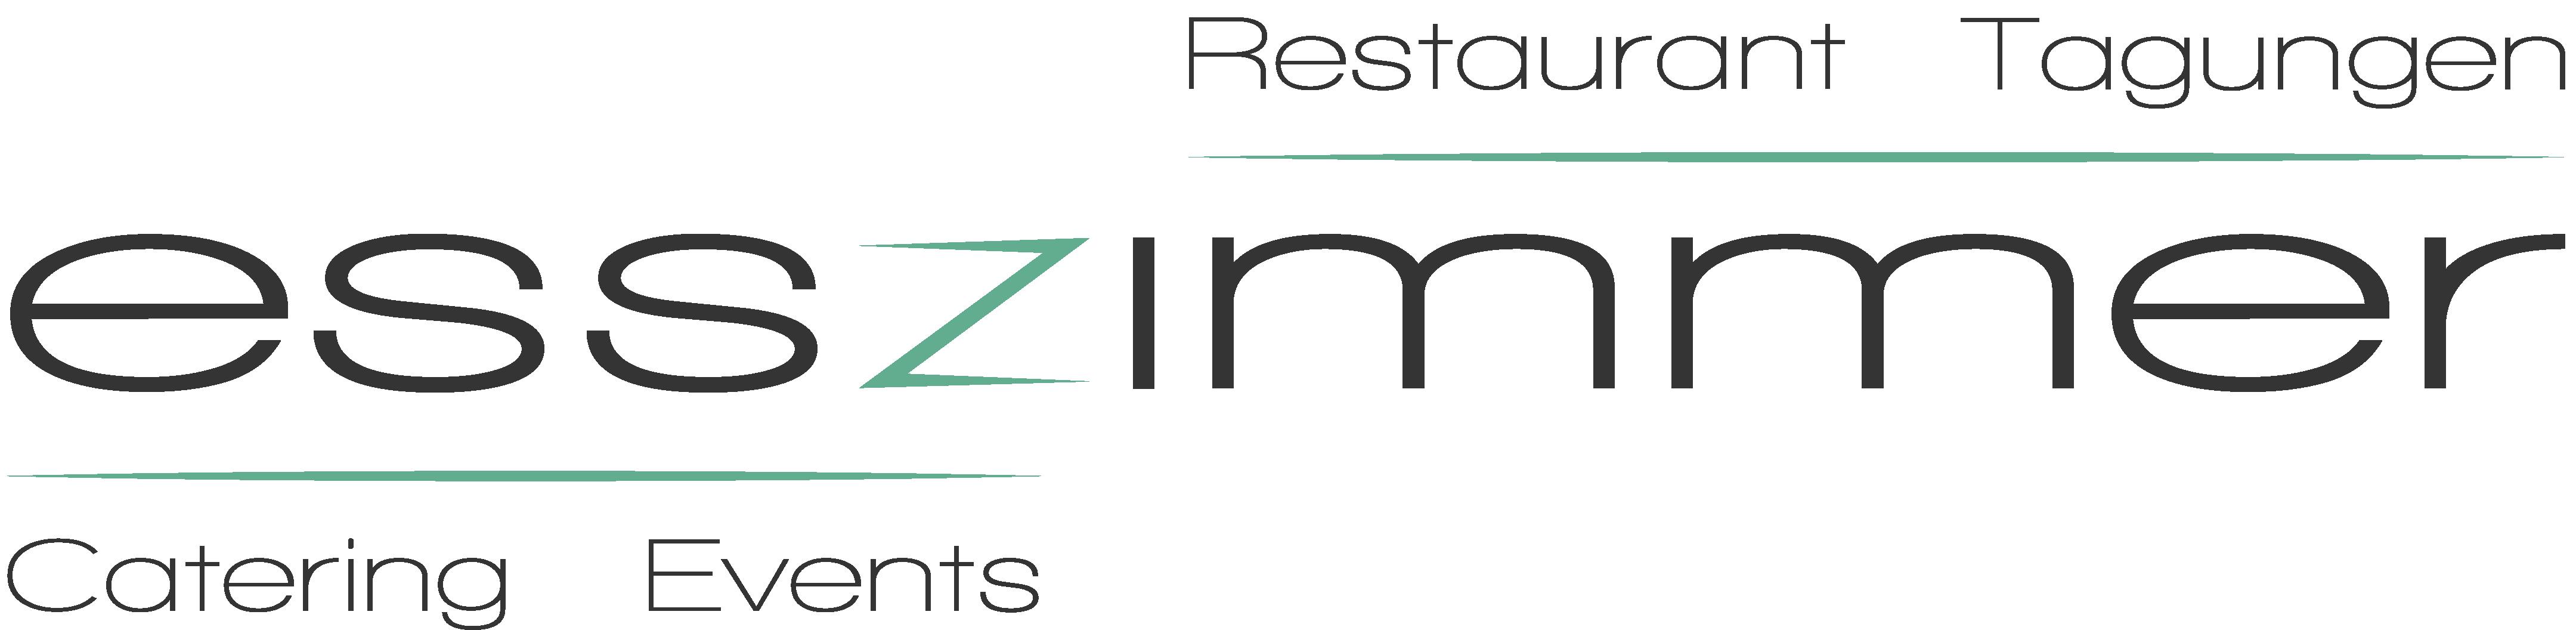 esszimmer-restaurant-neunburg